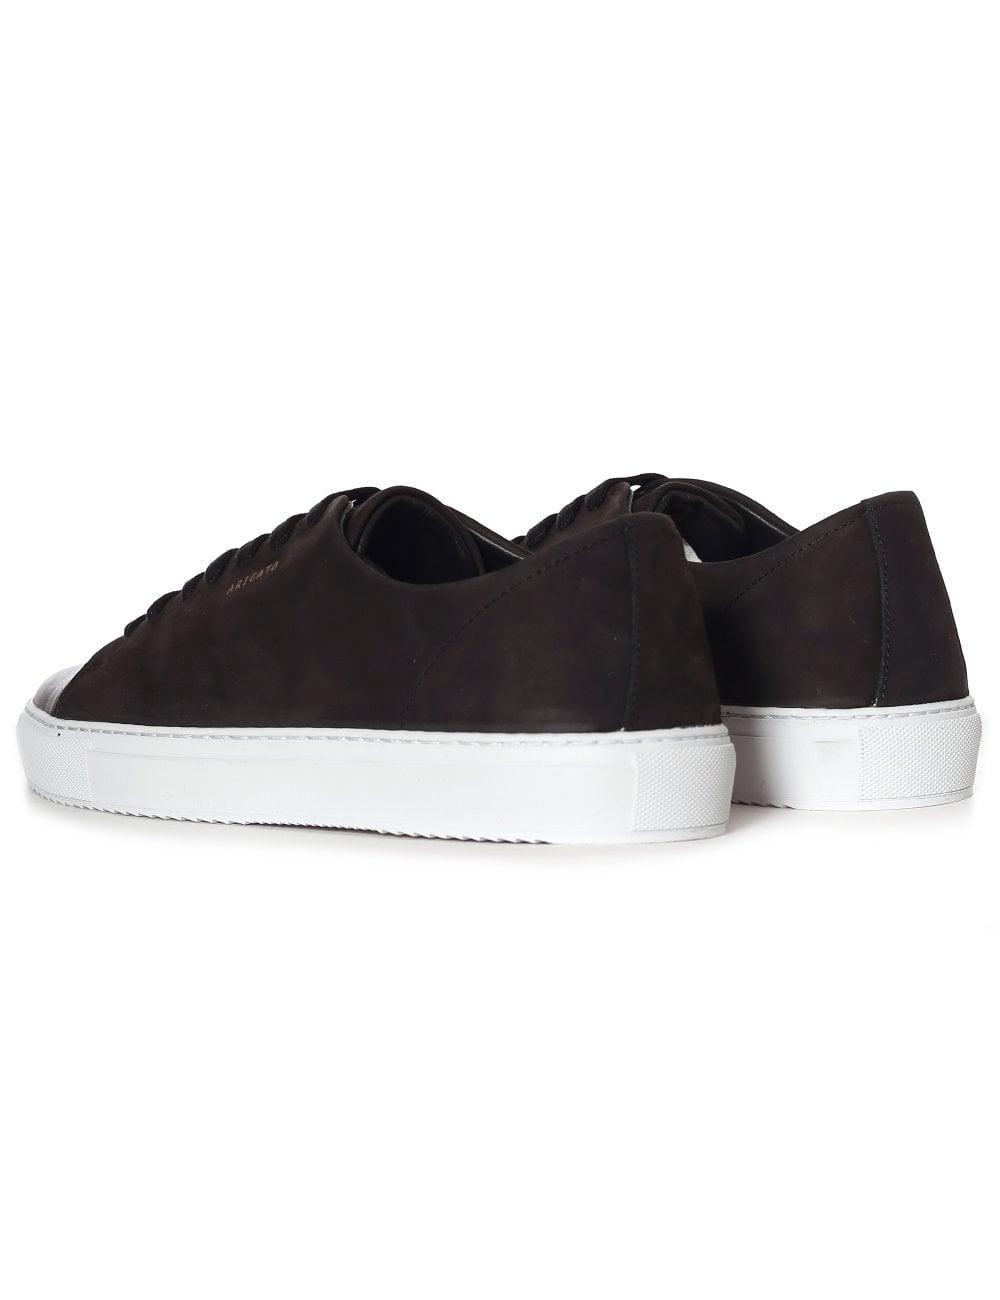 mode baskets grande vente au rabais Low Top Cap-toe Sneaker